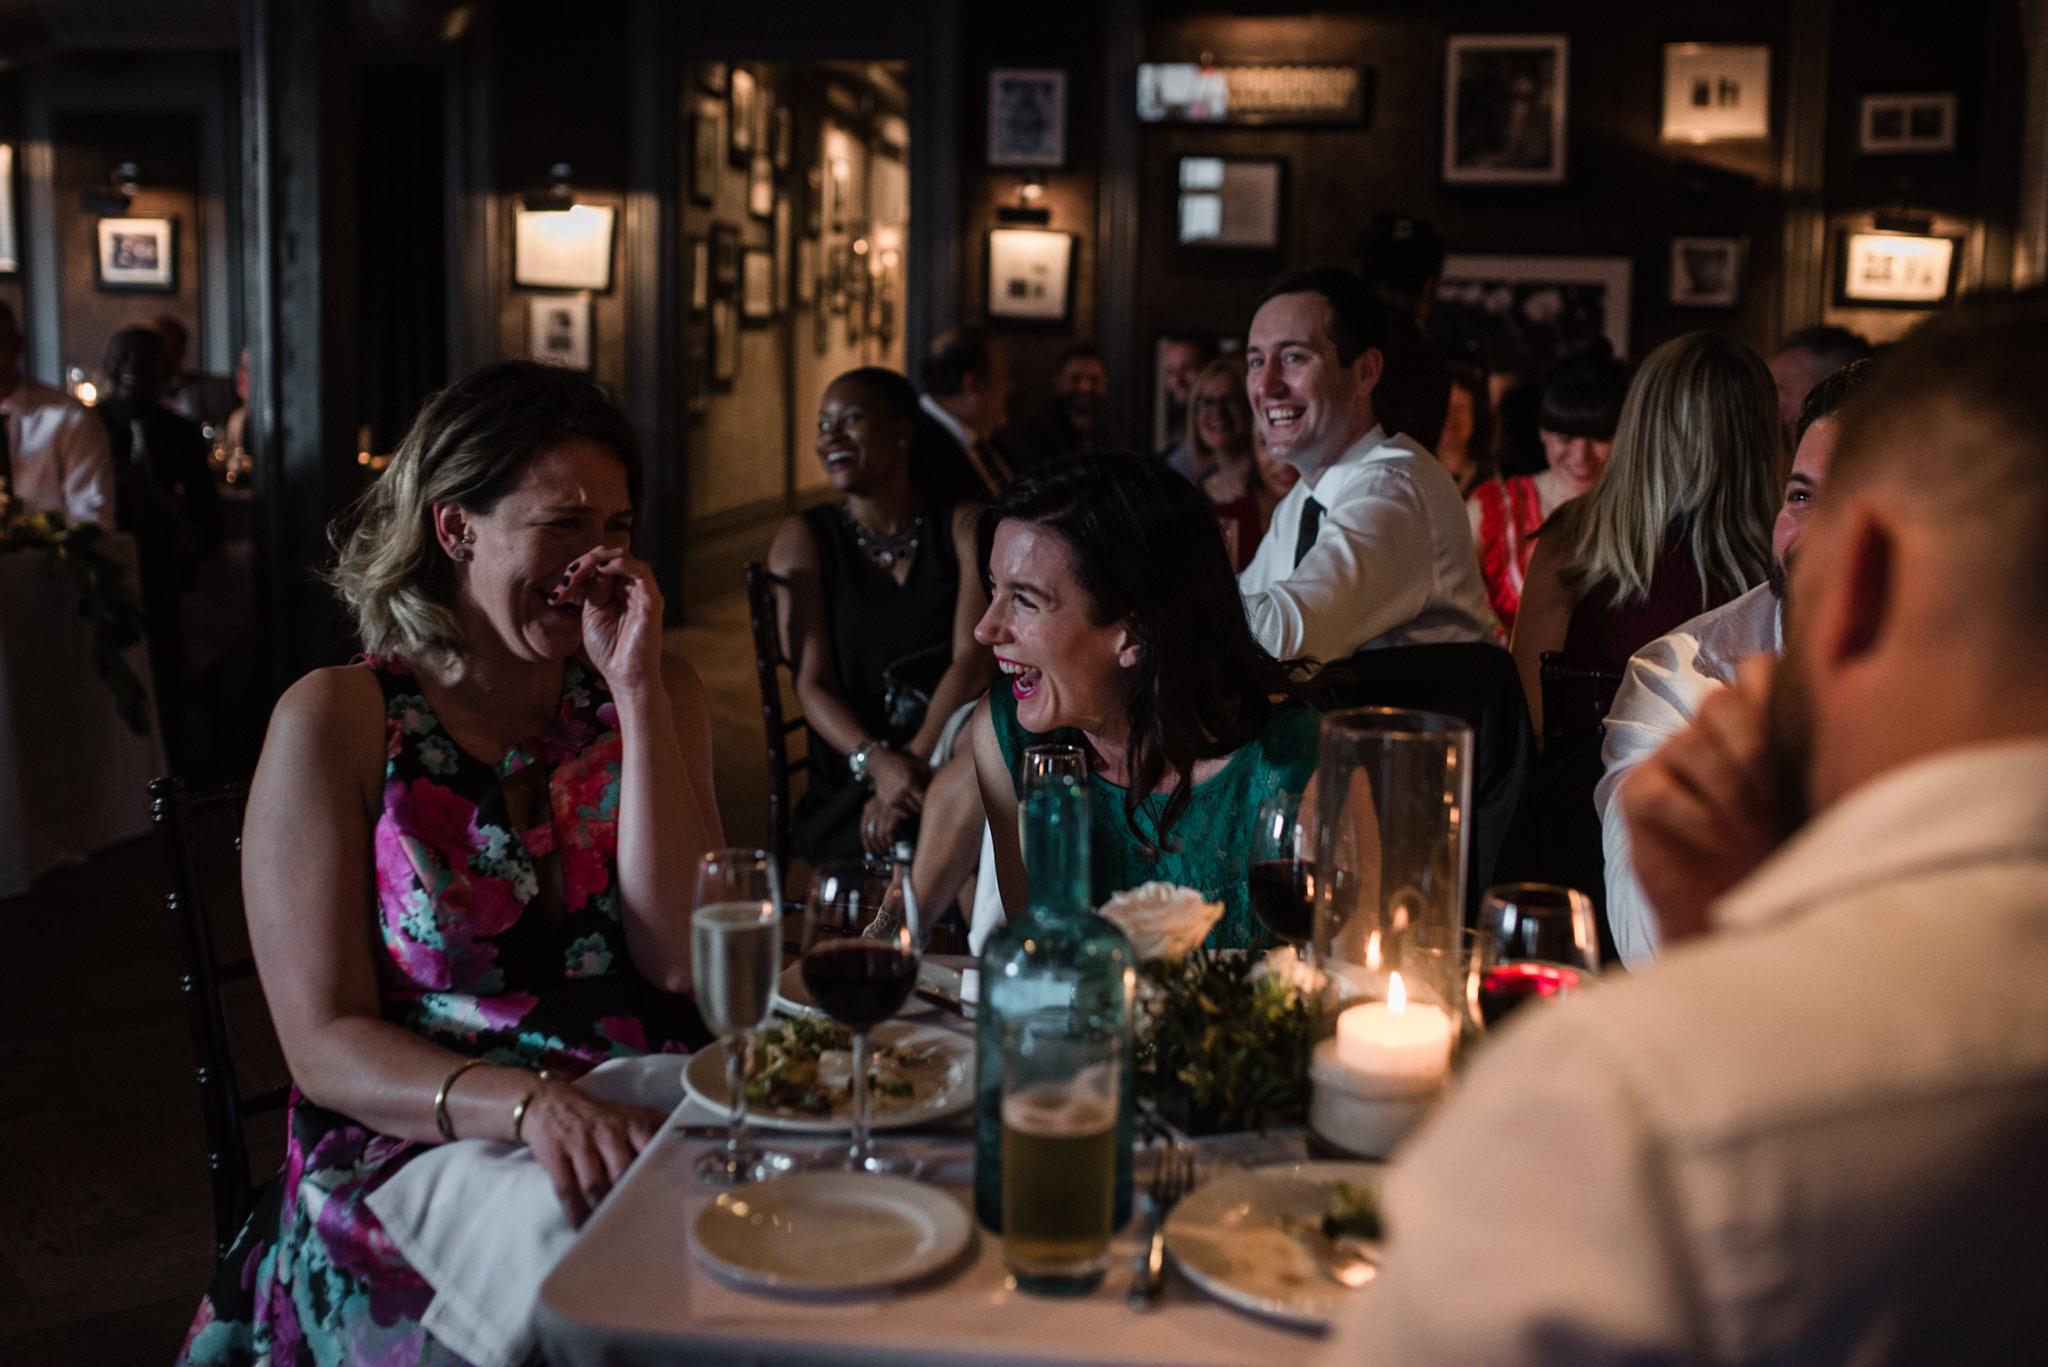 070-guests-candids-documentary-wedding-photographer-reception-storys-toronto.jpg